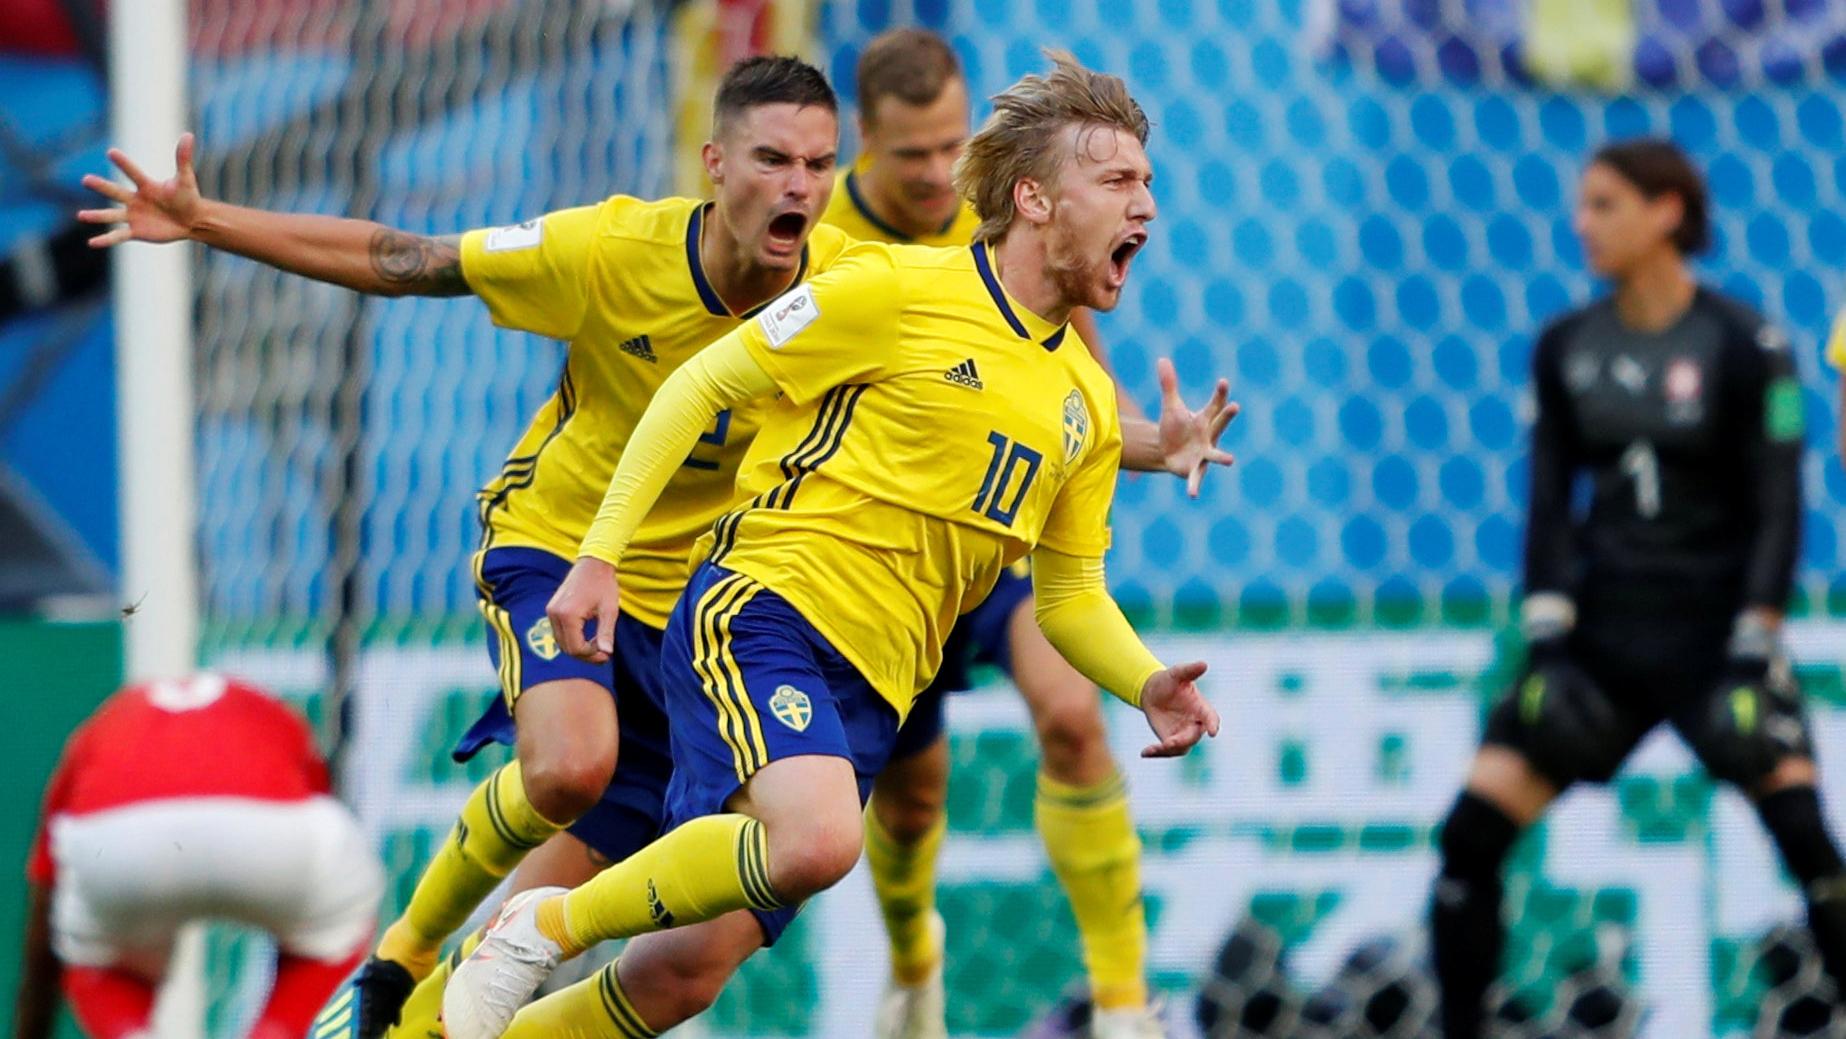 Sverige vinner med fyra sekunder kvar